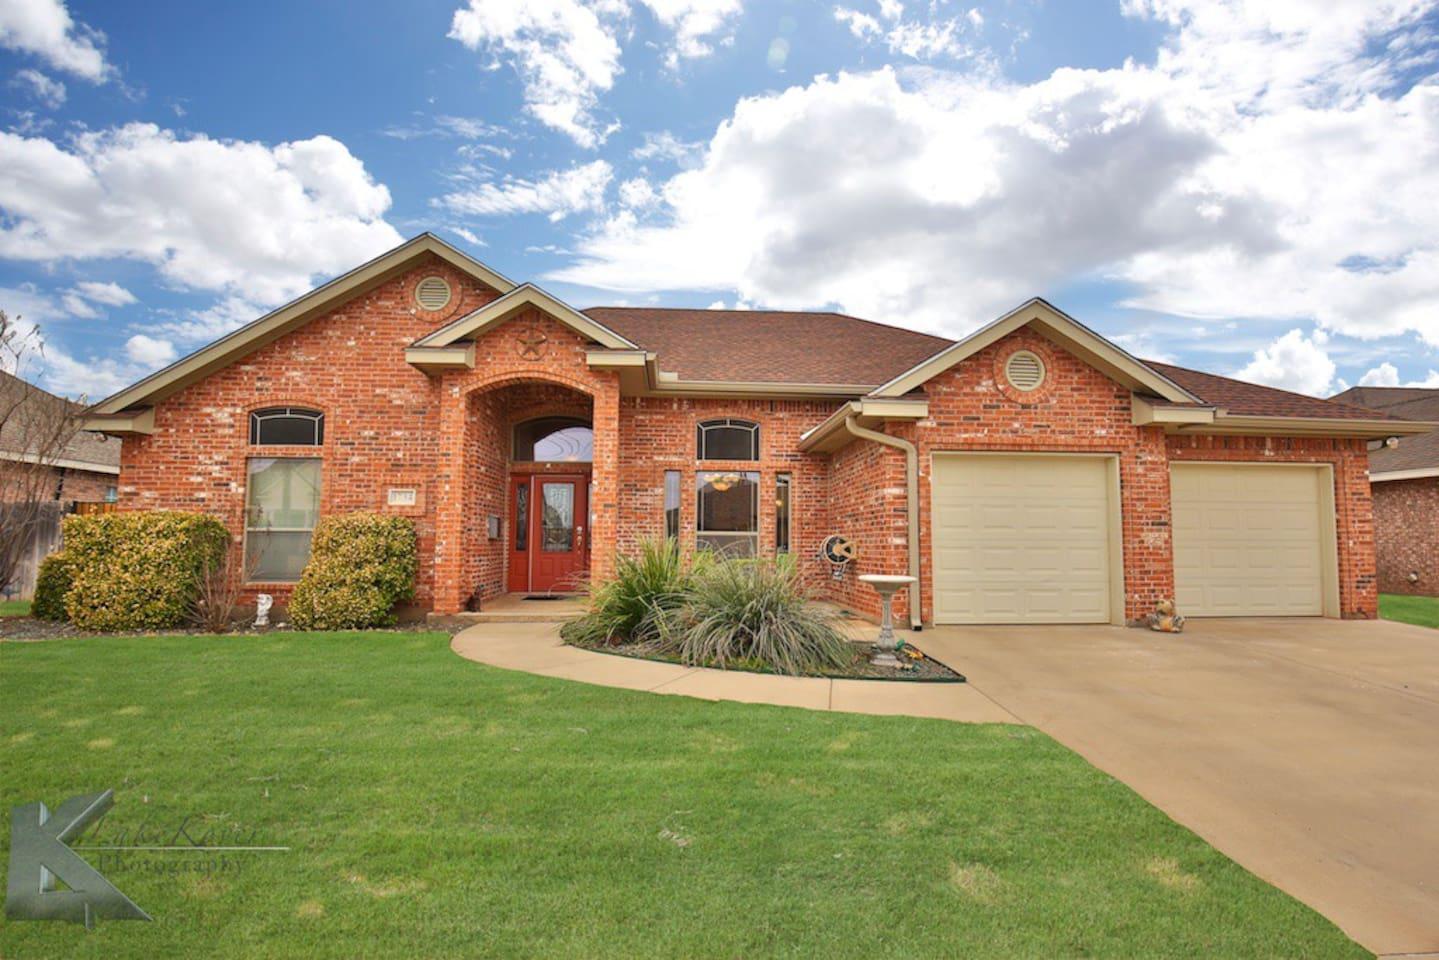 Beautiful home near Abilene Christian University.